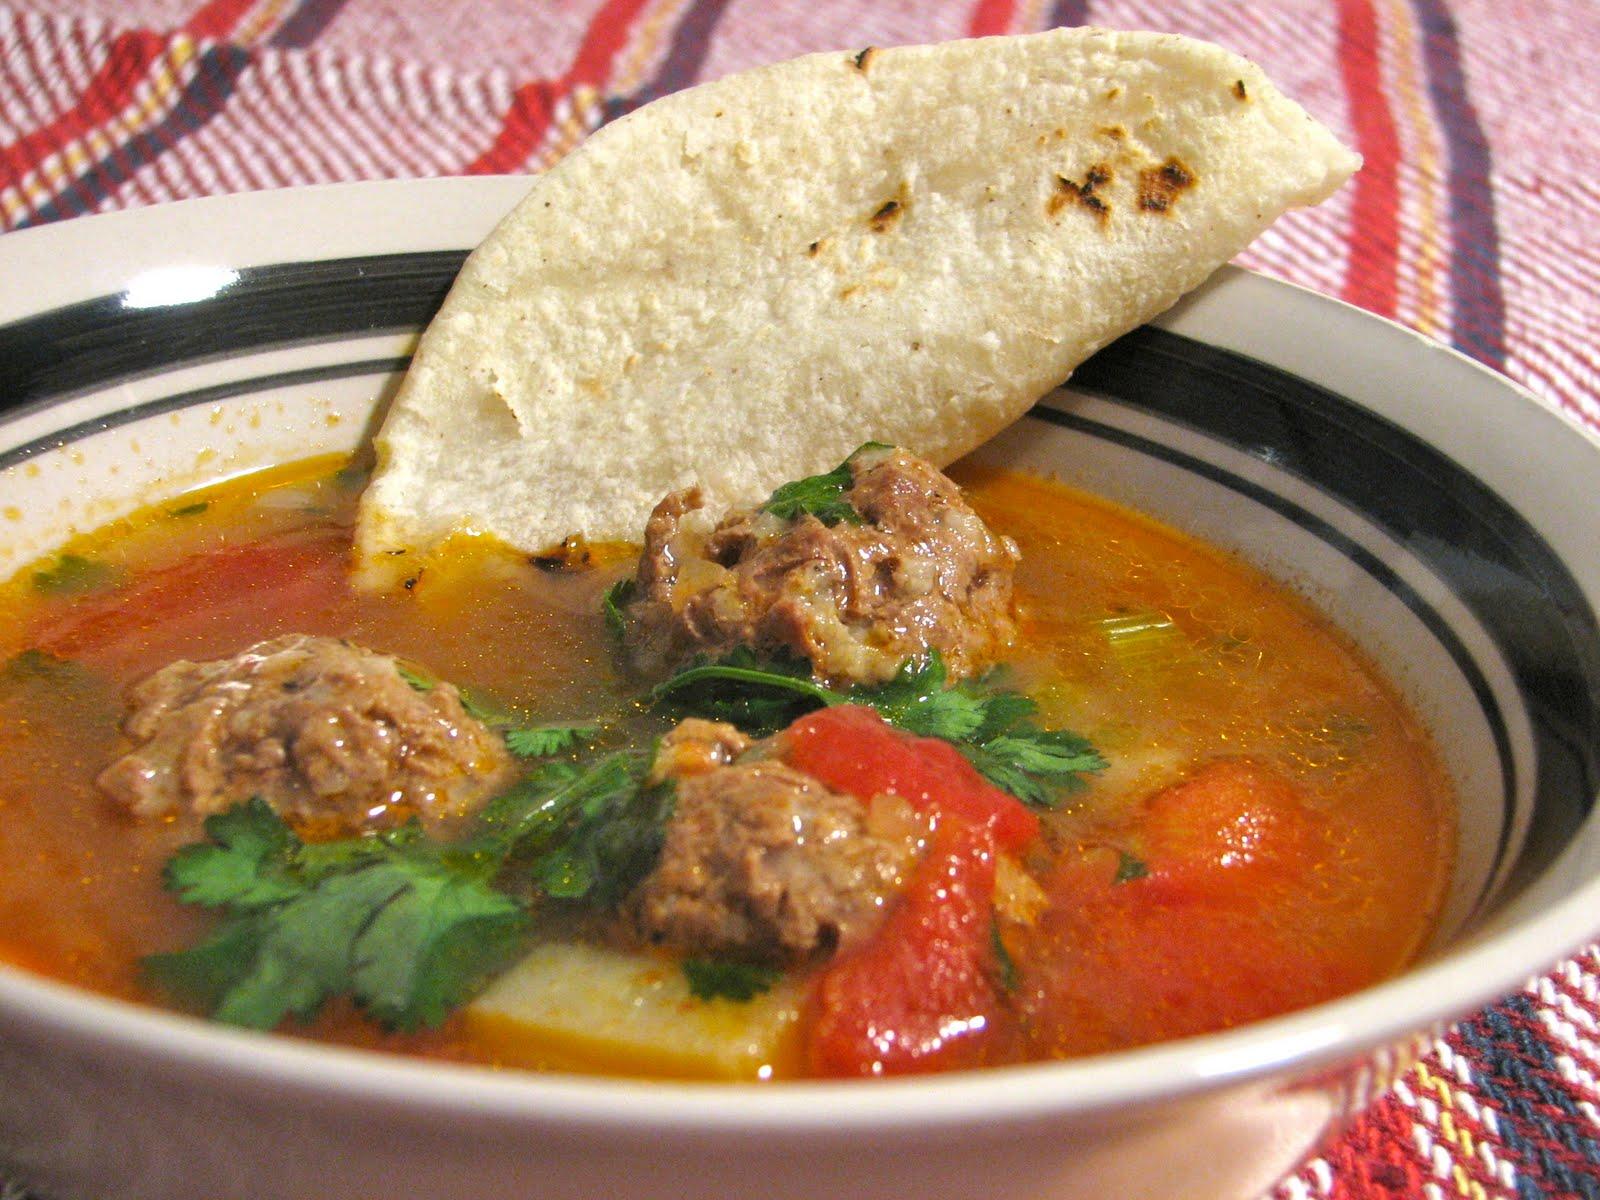 ... soup italian meatball soup italian meatball soup italian meatball soup